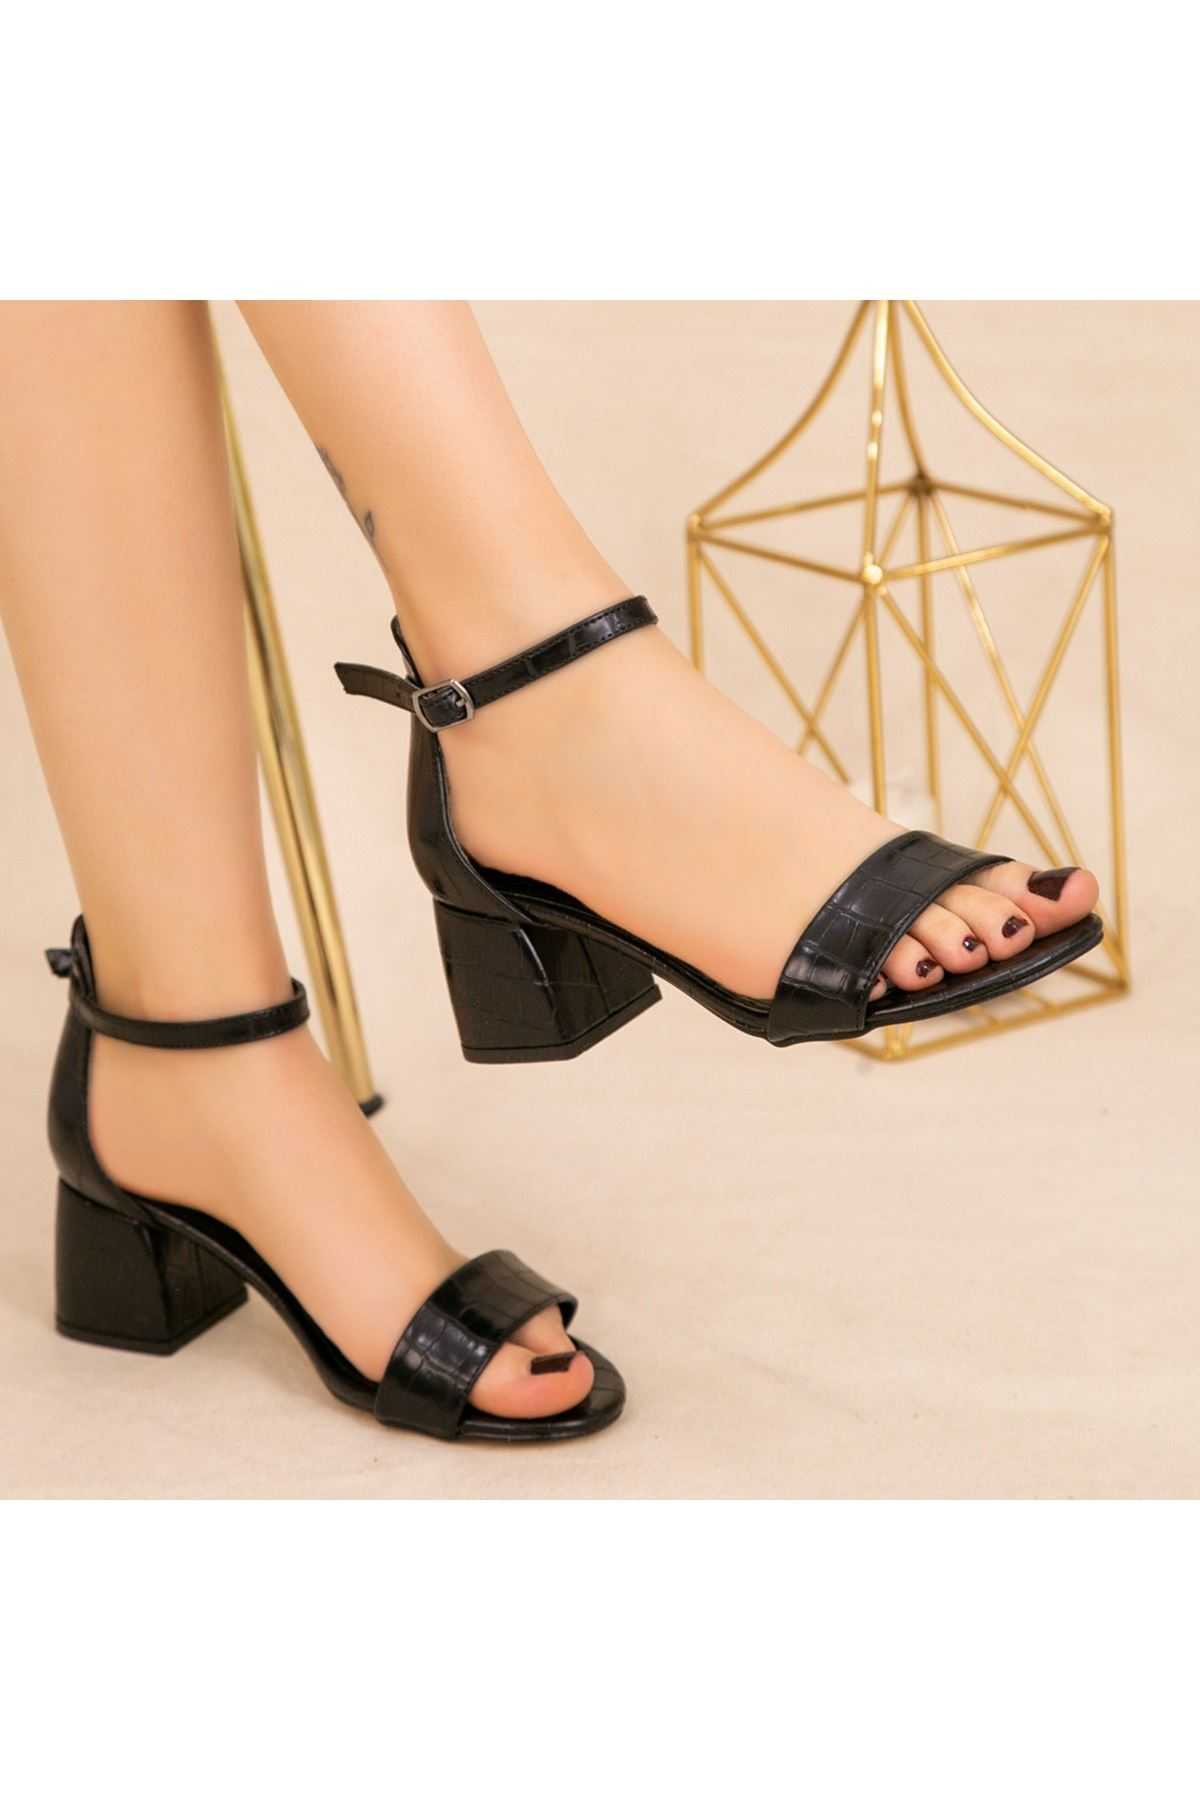 Epon Siyah Cilt Desenli Tek Bant Topuklu Ayakkabı